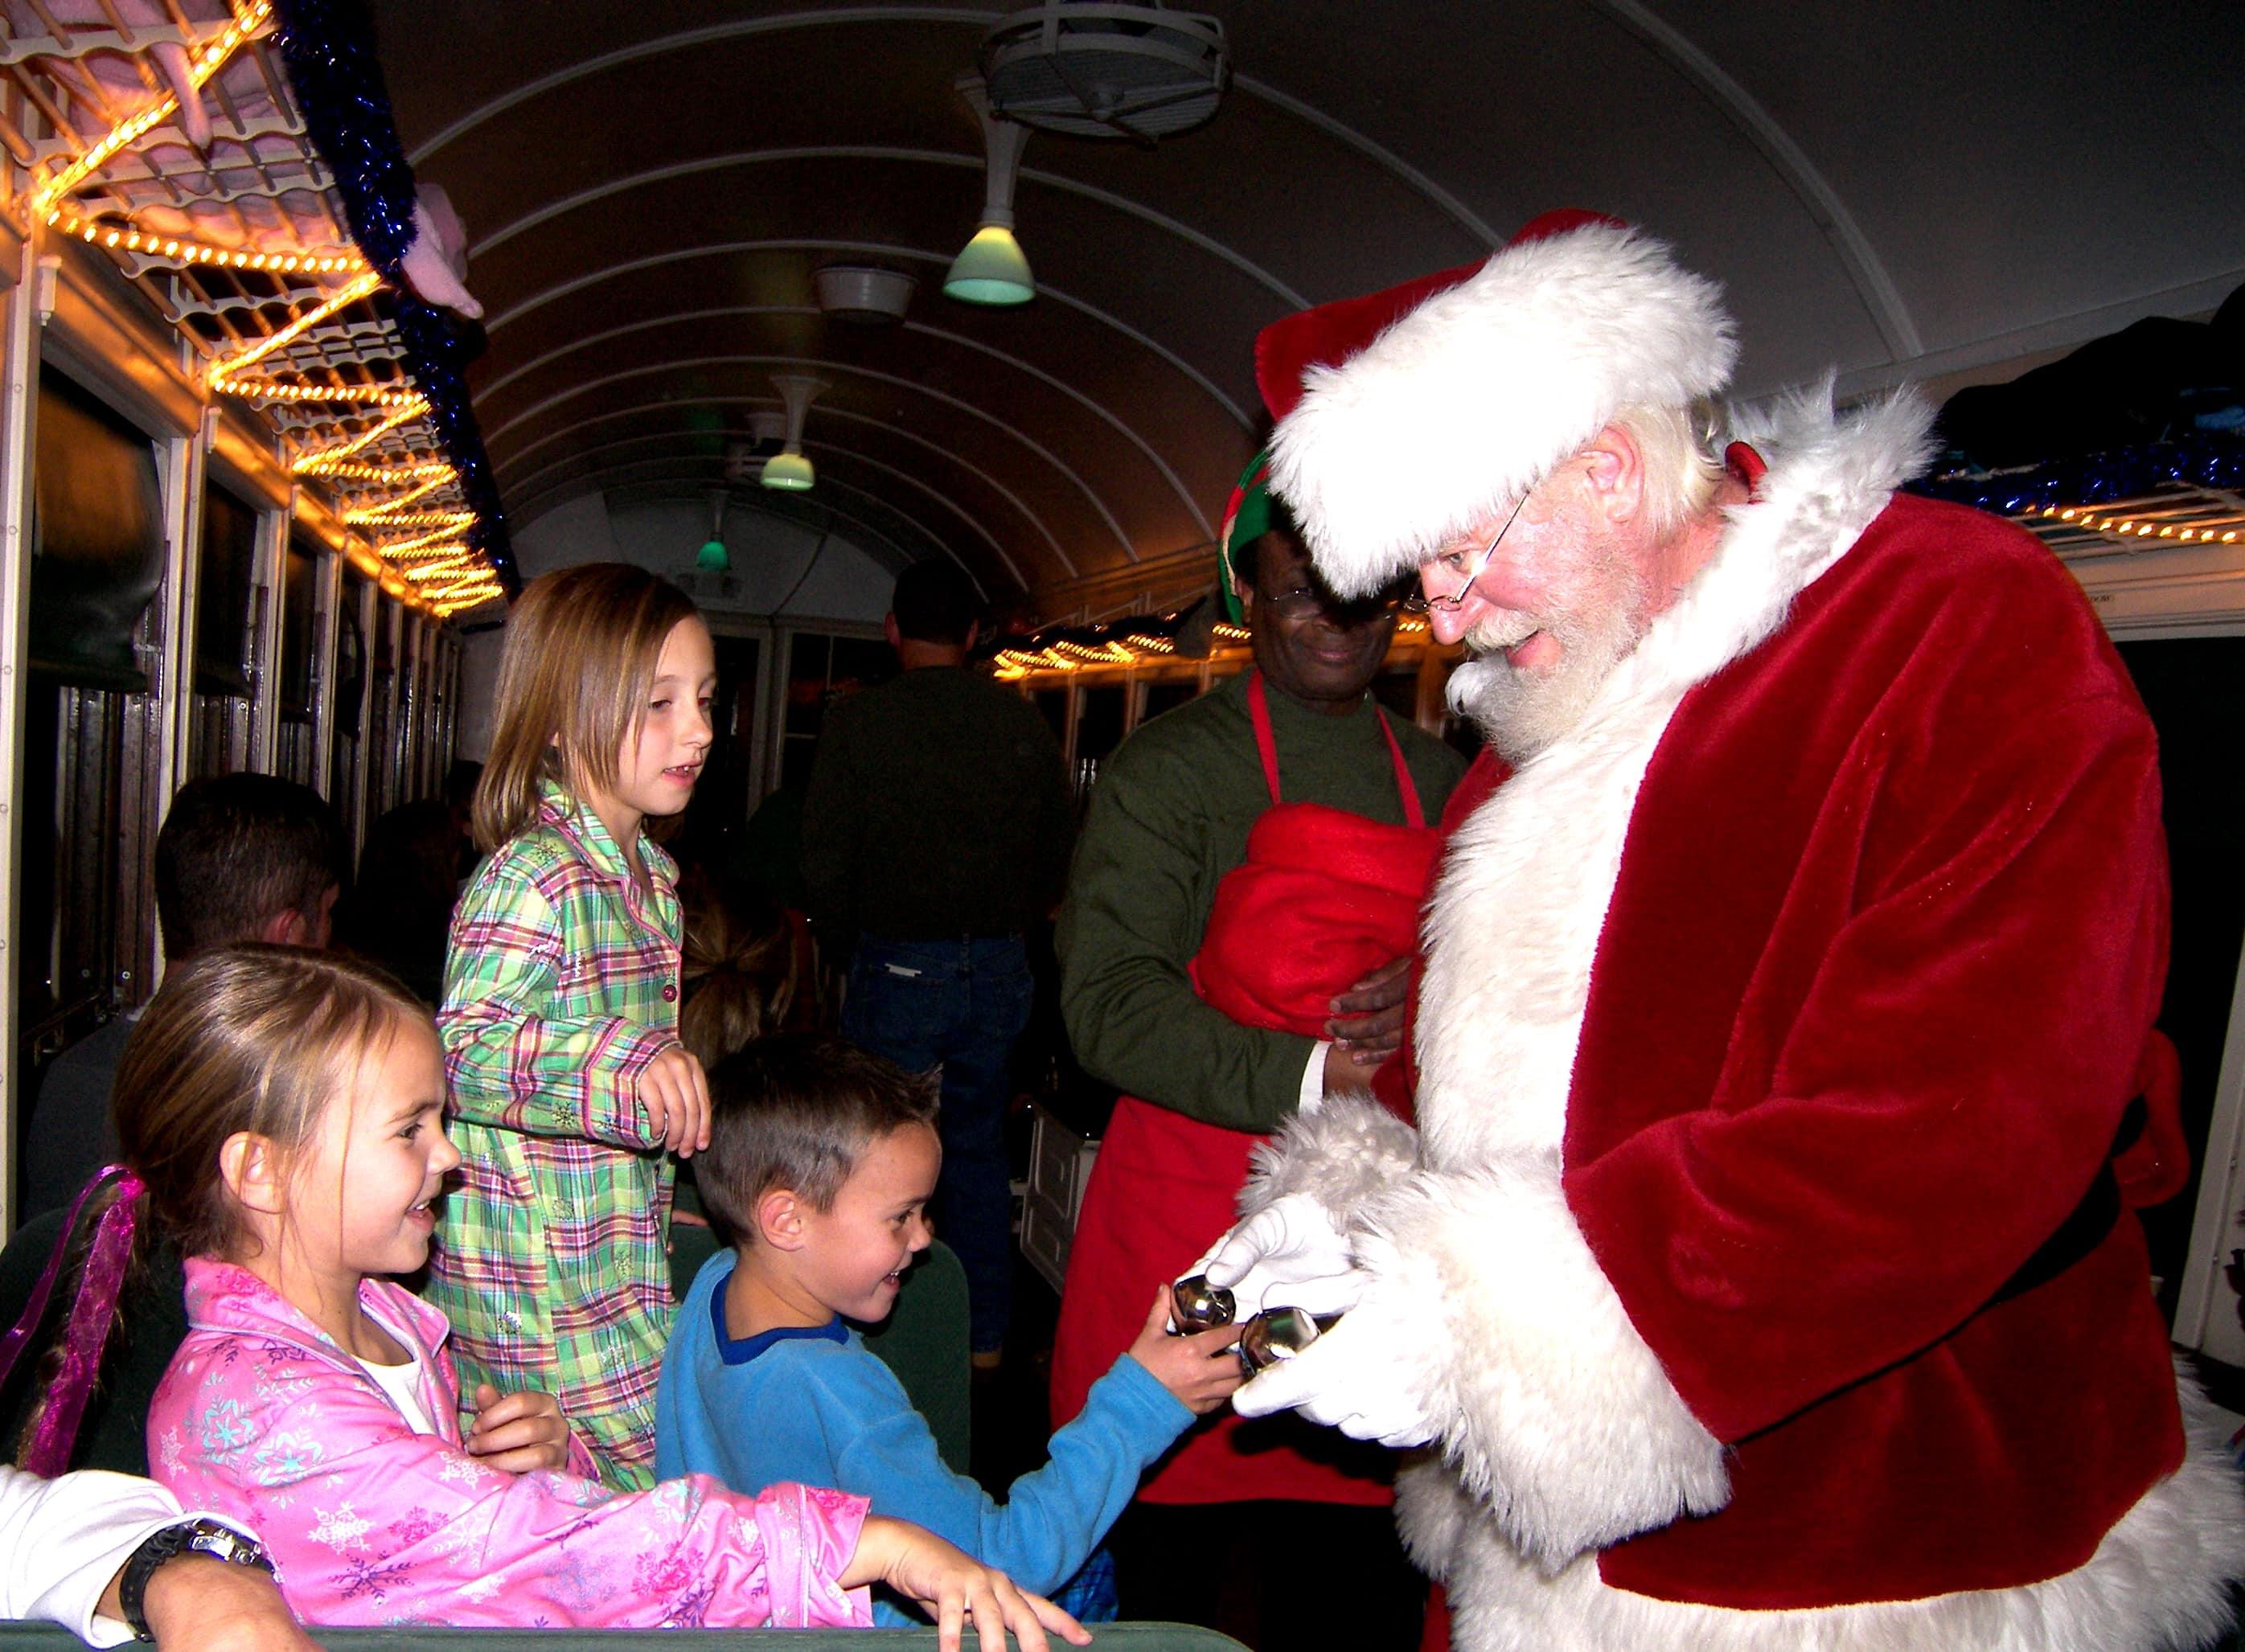 Christmas Bucket List. 10 Ways to Feel the Christmas Spirit by Modern Honey. Polar Express Santa Claus.